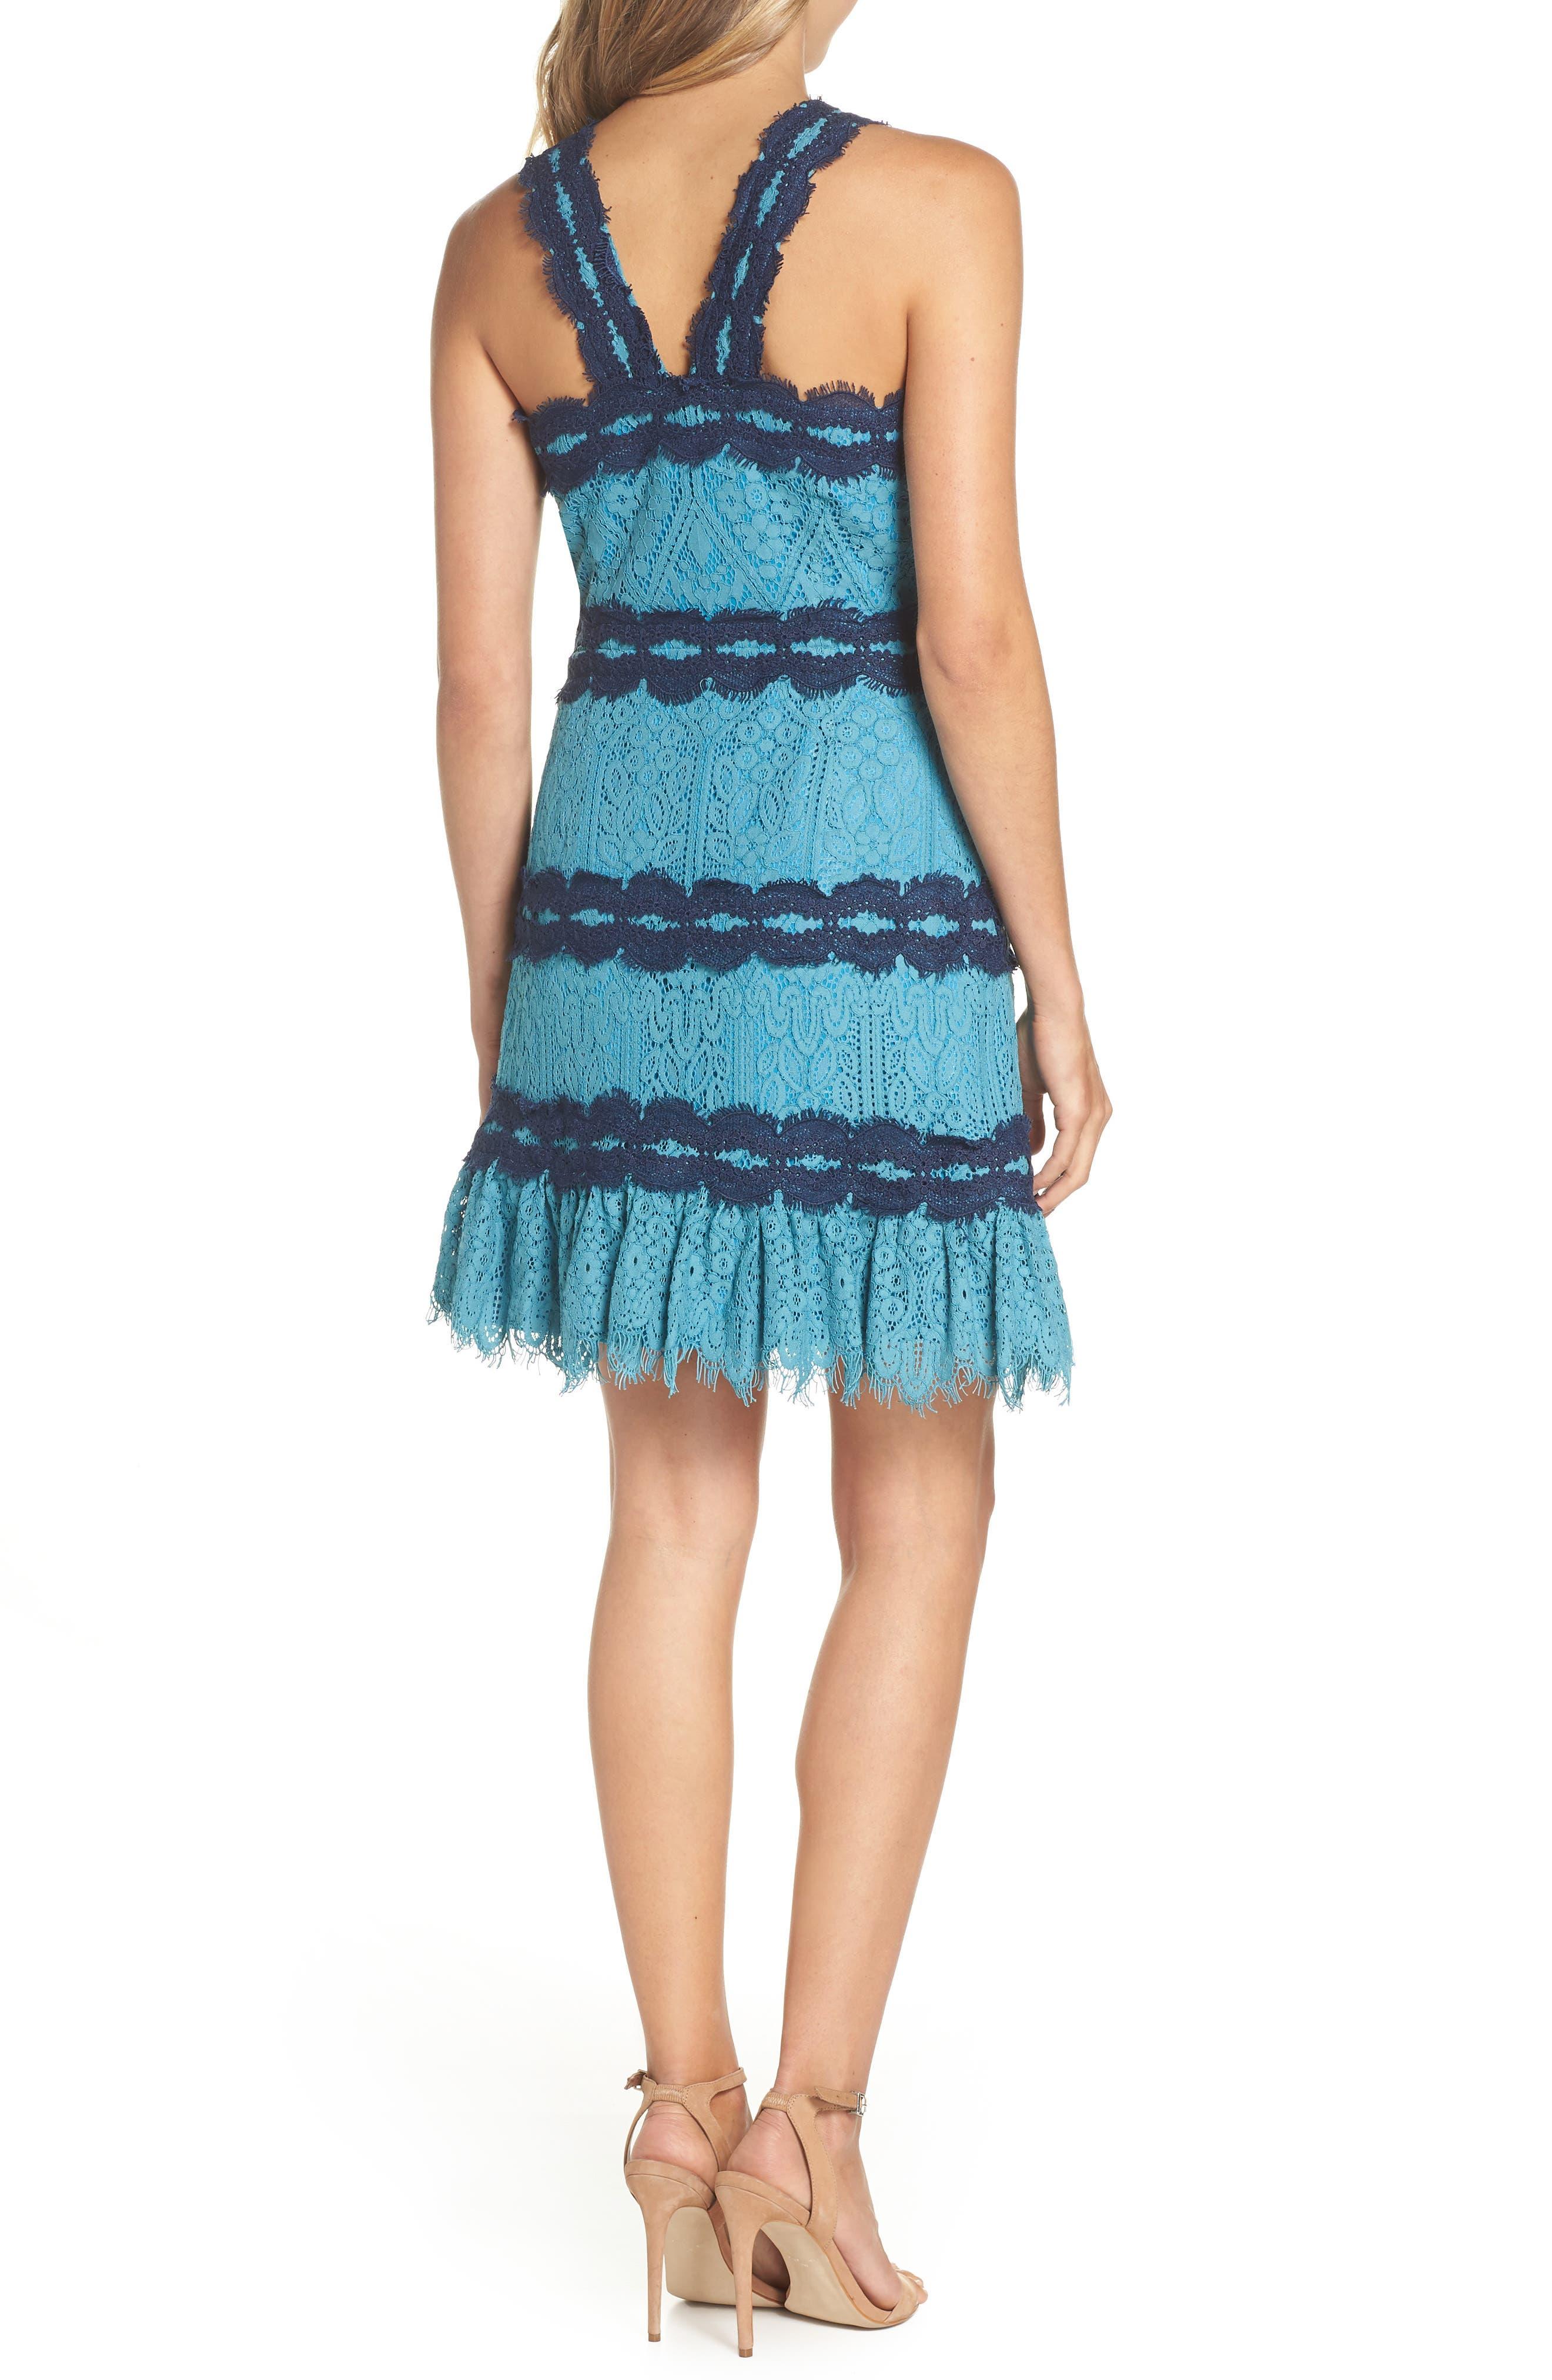 Lula Ruffle Lace Dress,                             Alternate thumbnail 2, color,                             TEAL/ NAVY